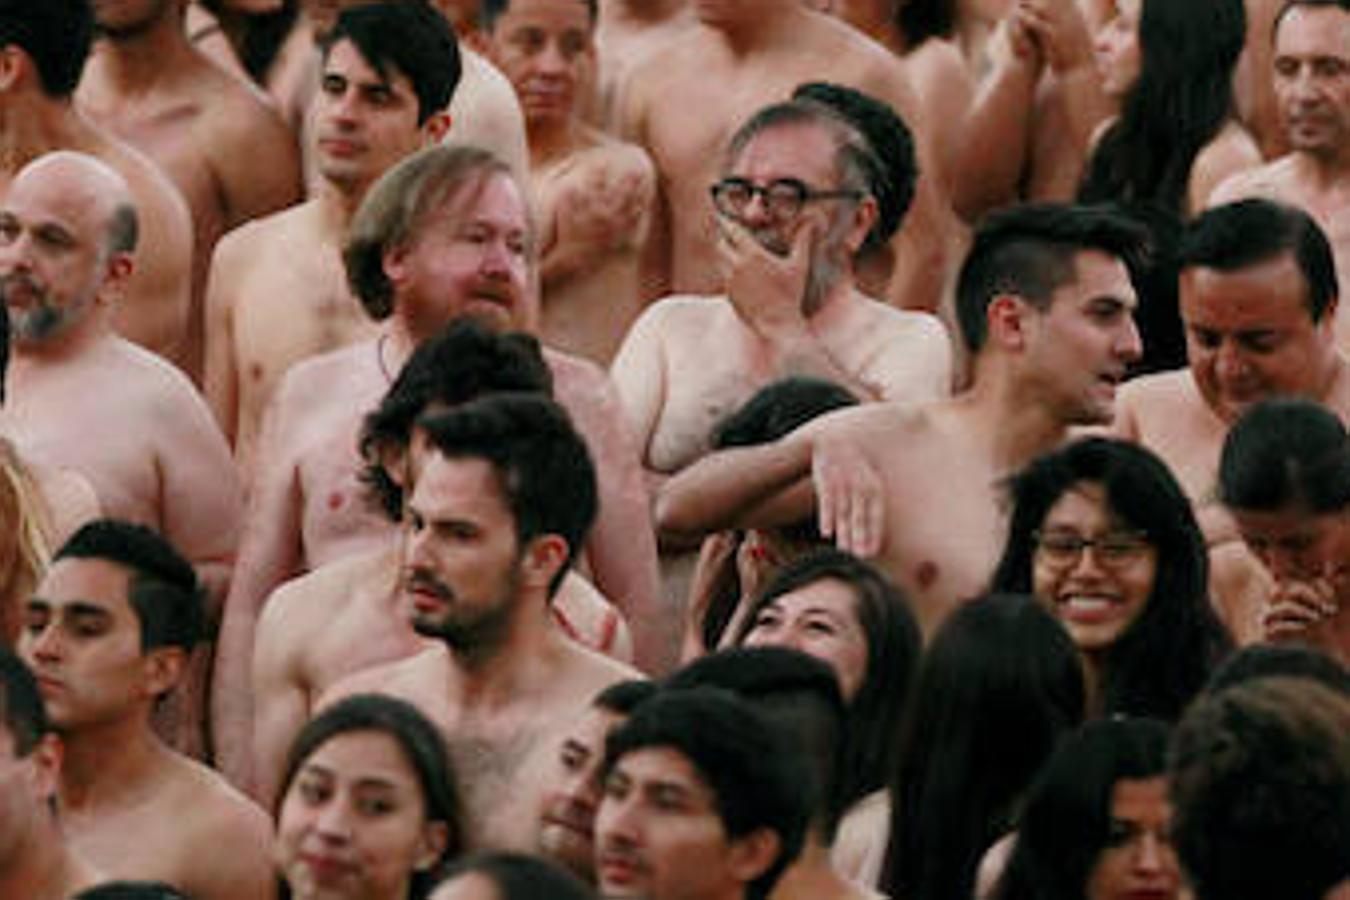 Tunick desnuda a una multitud en la plaza Bolívar de Bogotá